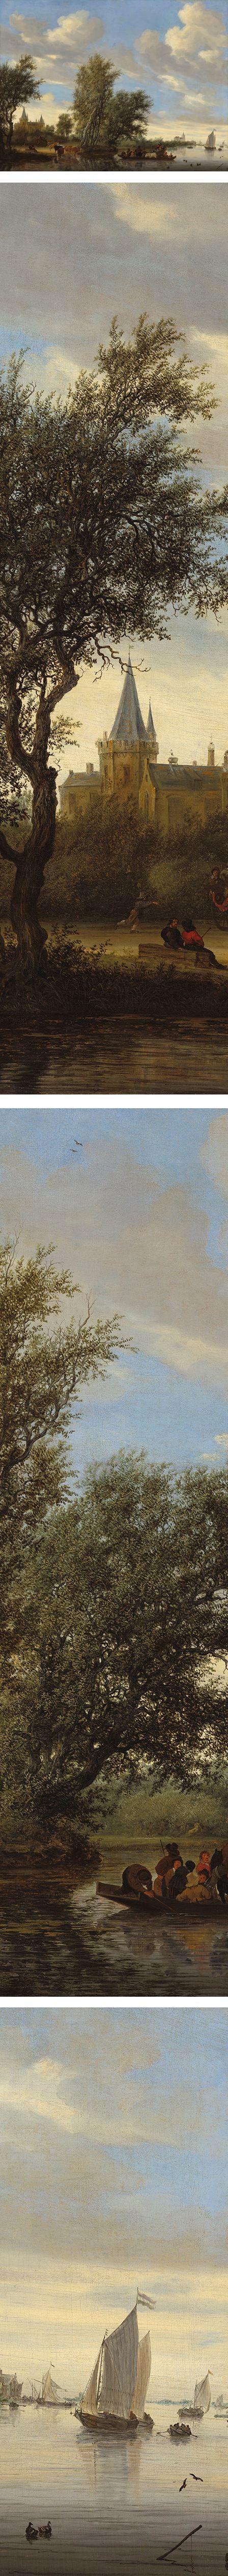 Eye Candy for Today: Salomon van Ruysdael river landscape